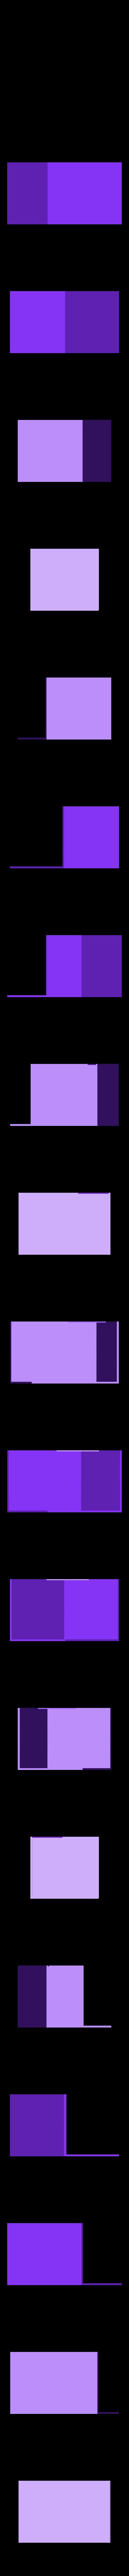 holder.STL Download free STL file Triple Deck Box • 3D print model, Bolrod